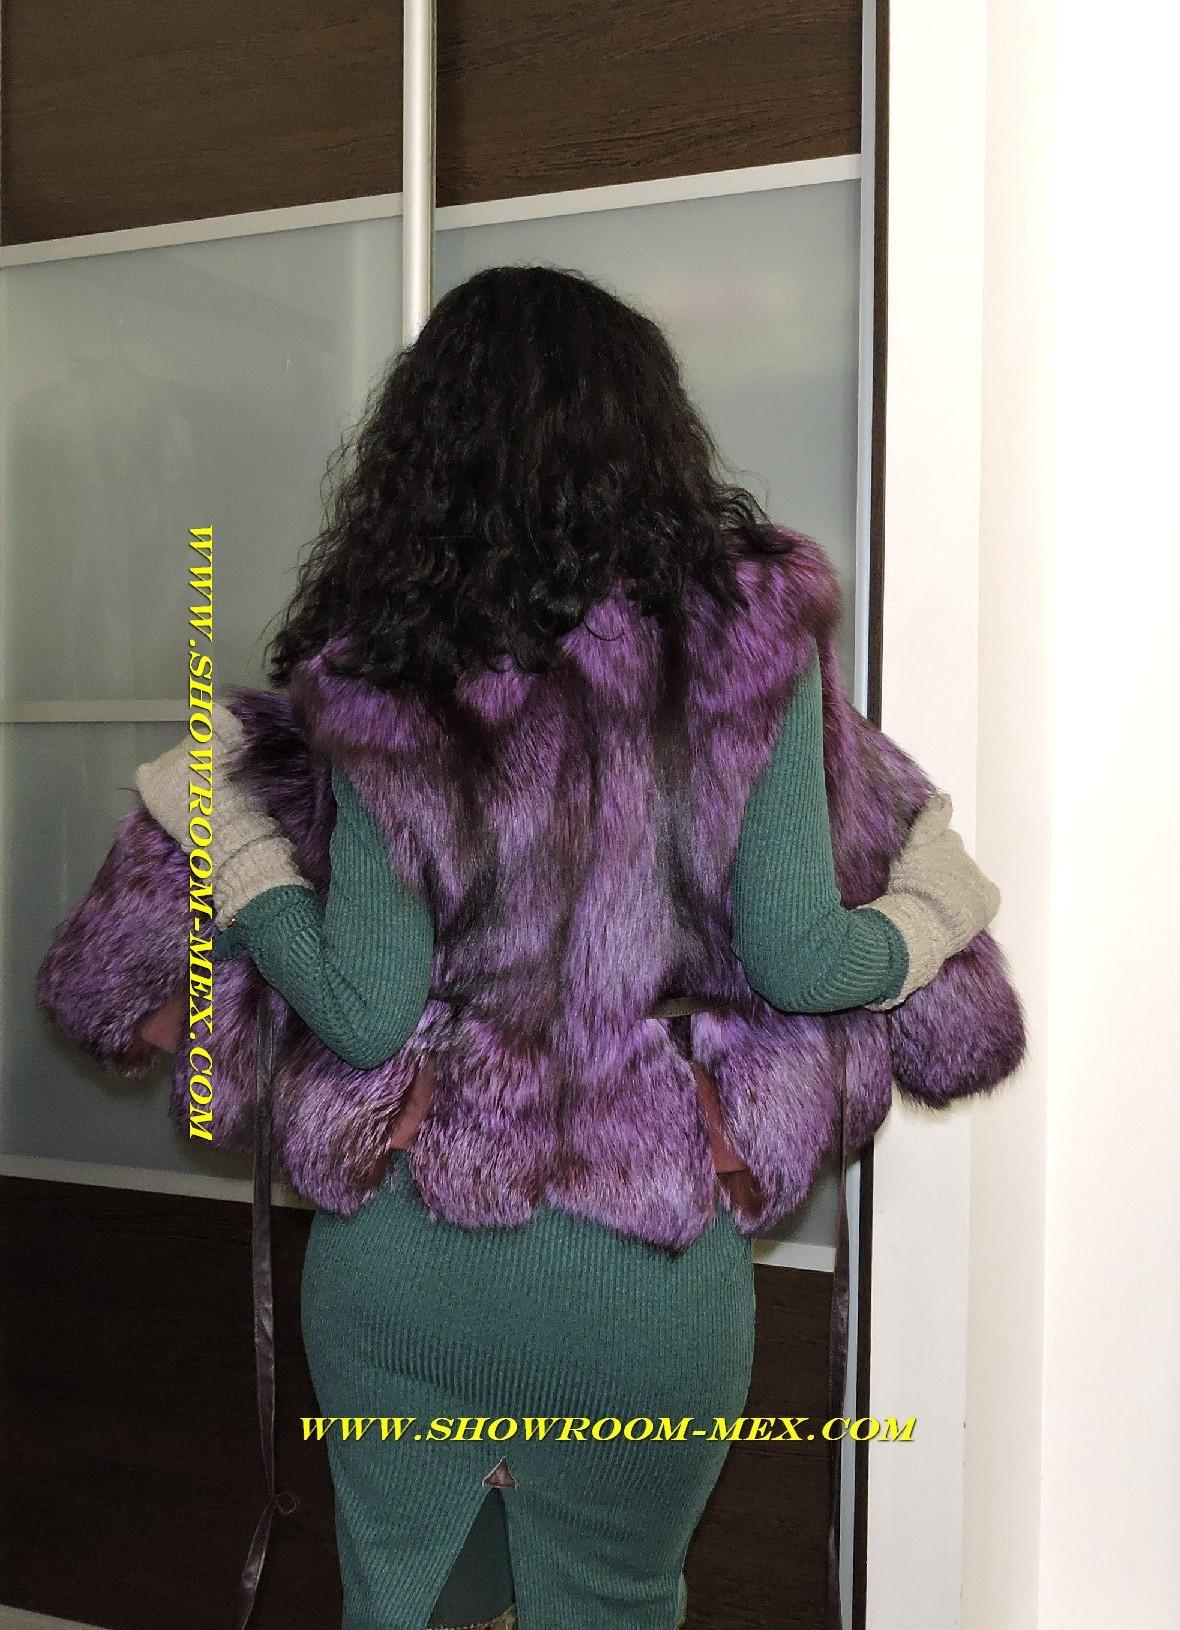 www.showroom-mex.com жилетка из лисы попечечка люкс 2017 s size 61.jpg